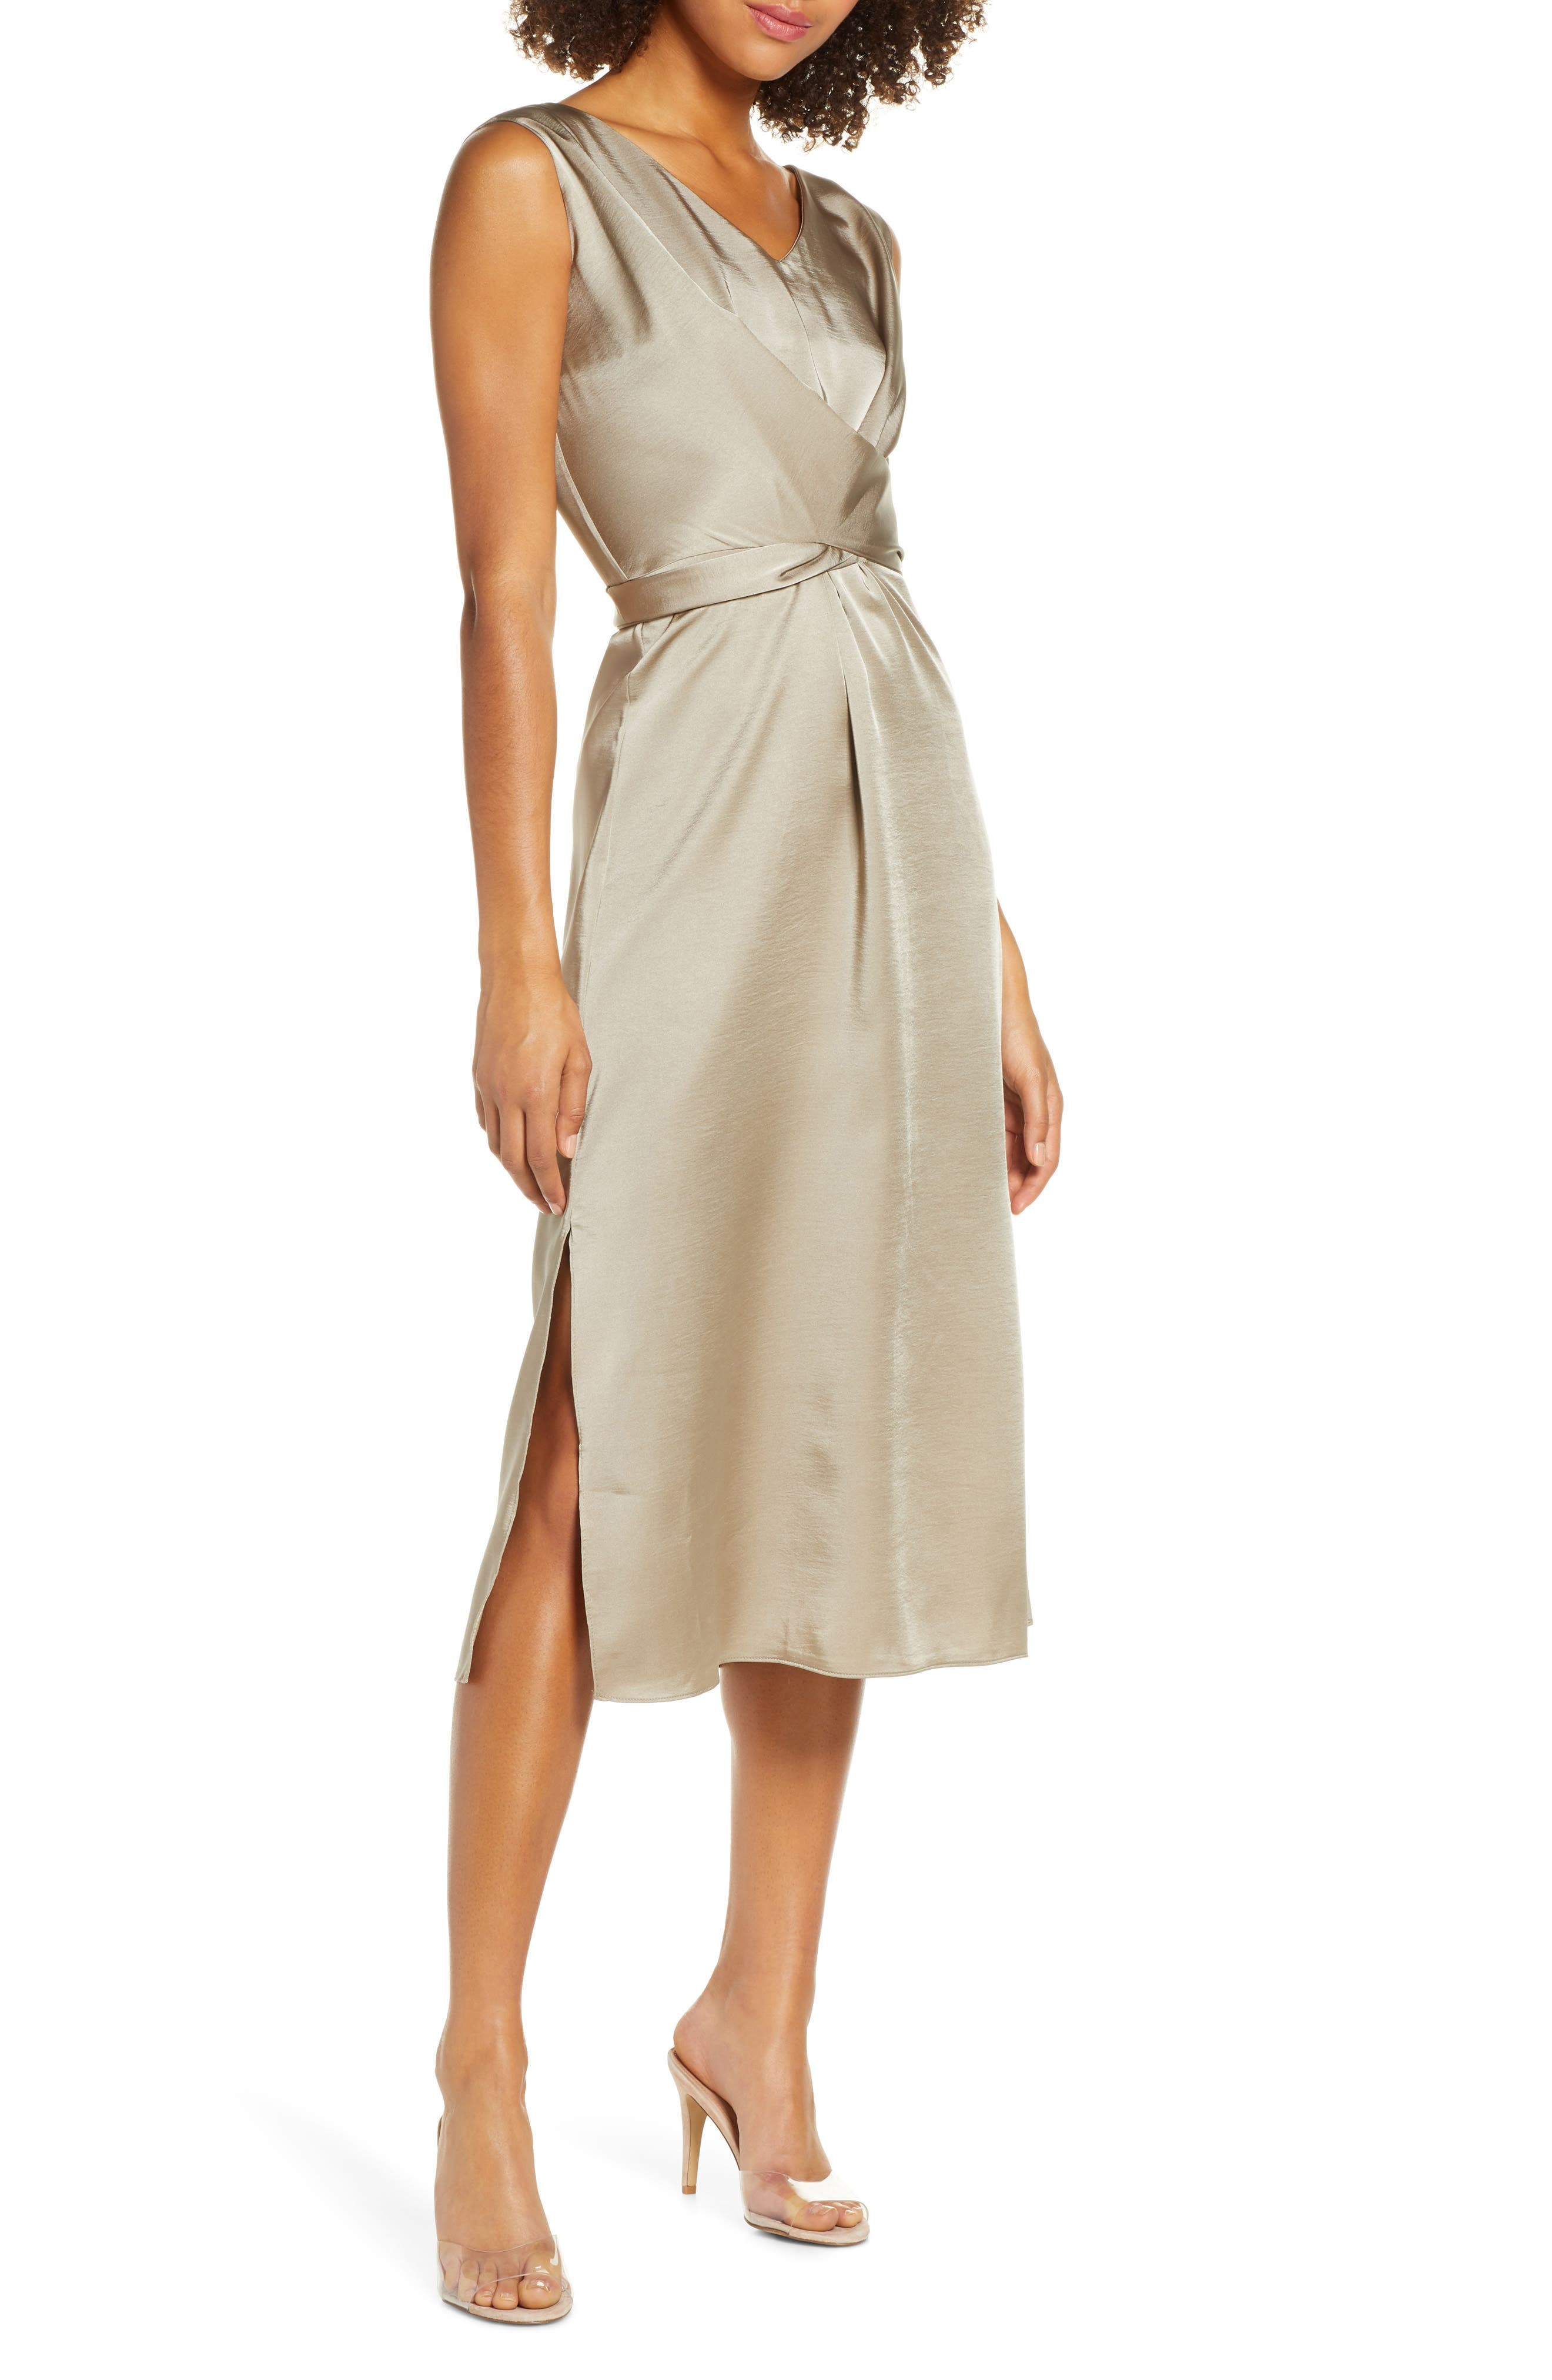 Caara Reeba Crisscross Satin Dress, Beige